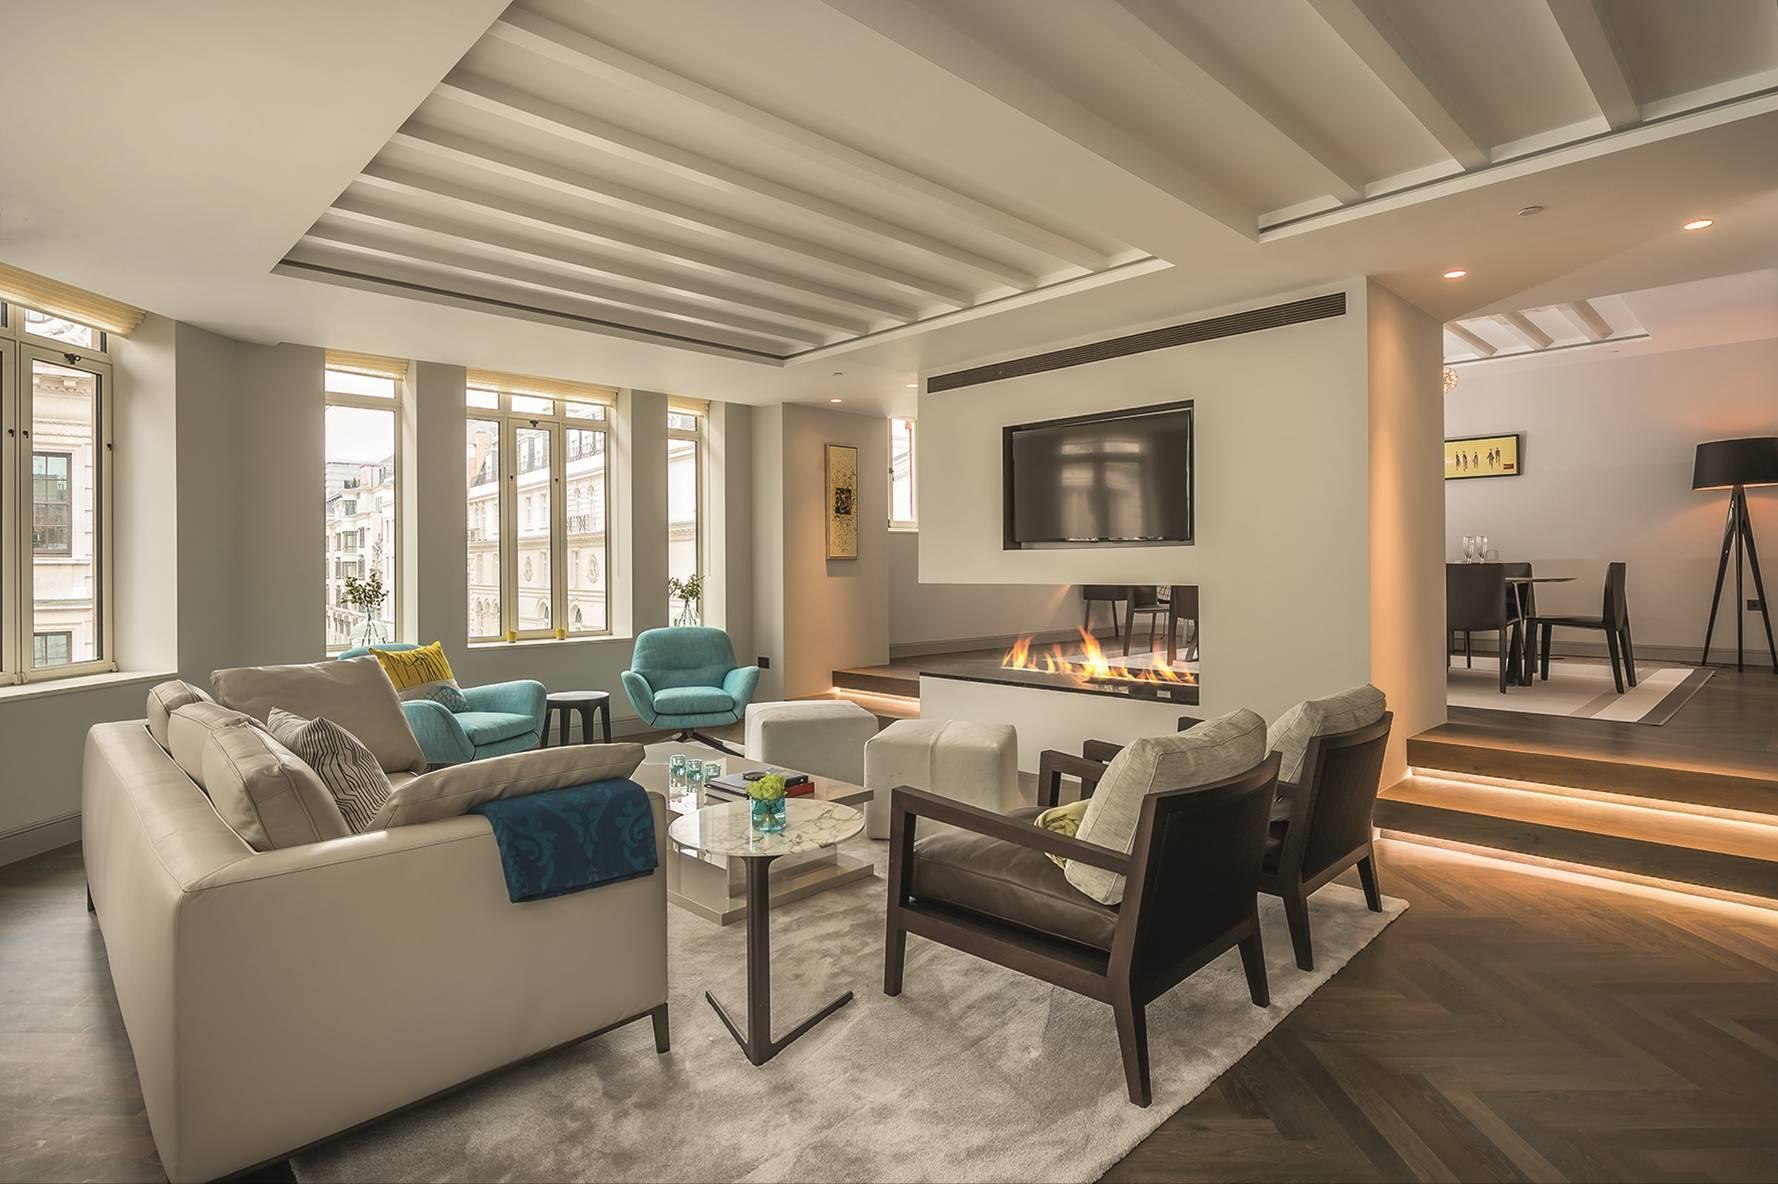 46-St-James-Penthouse-Living-Room